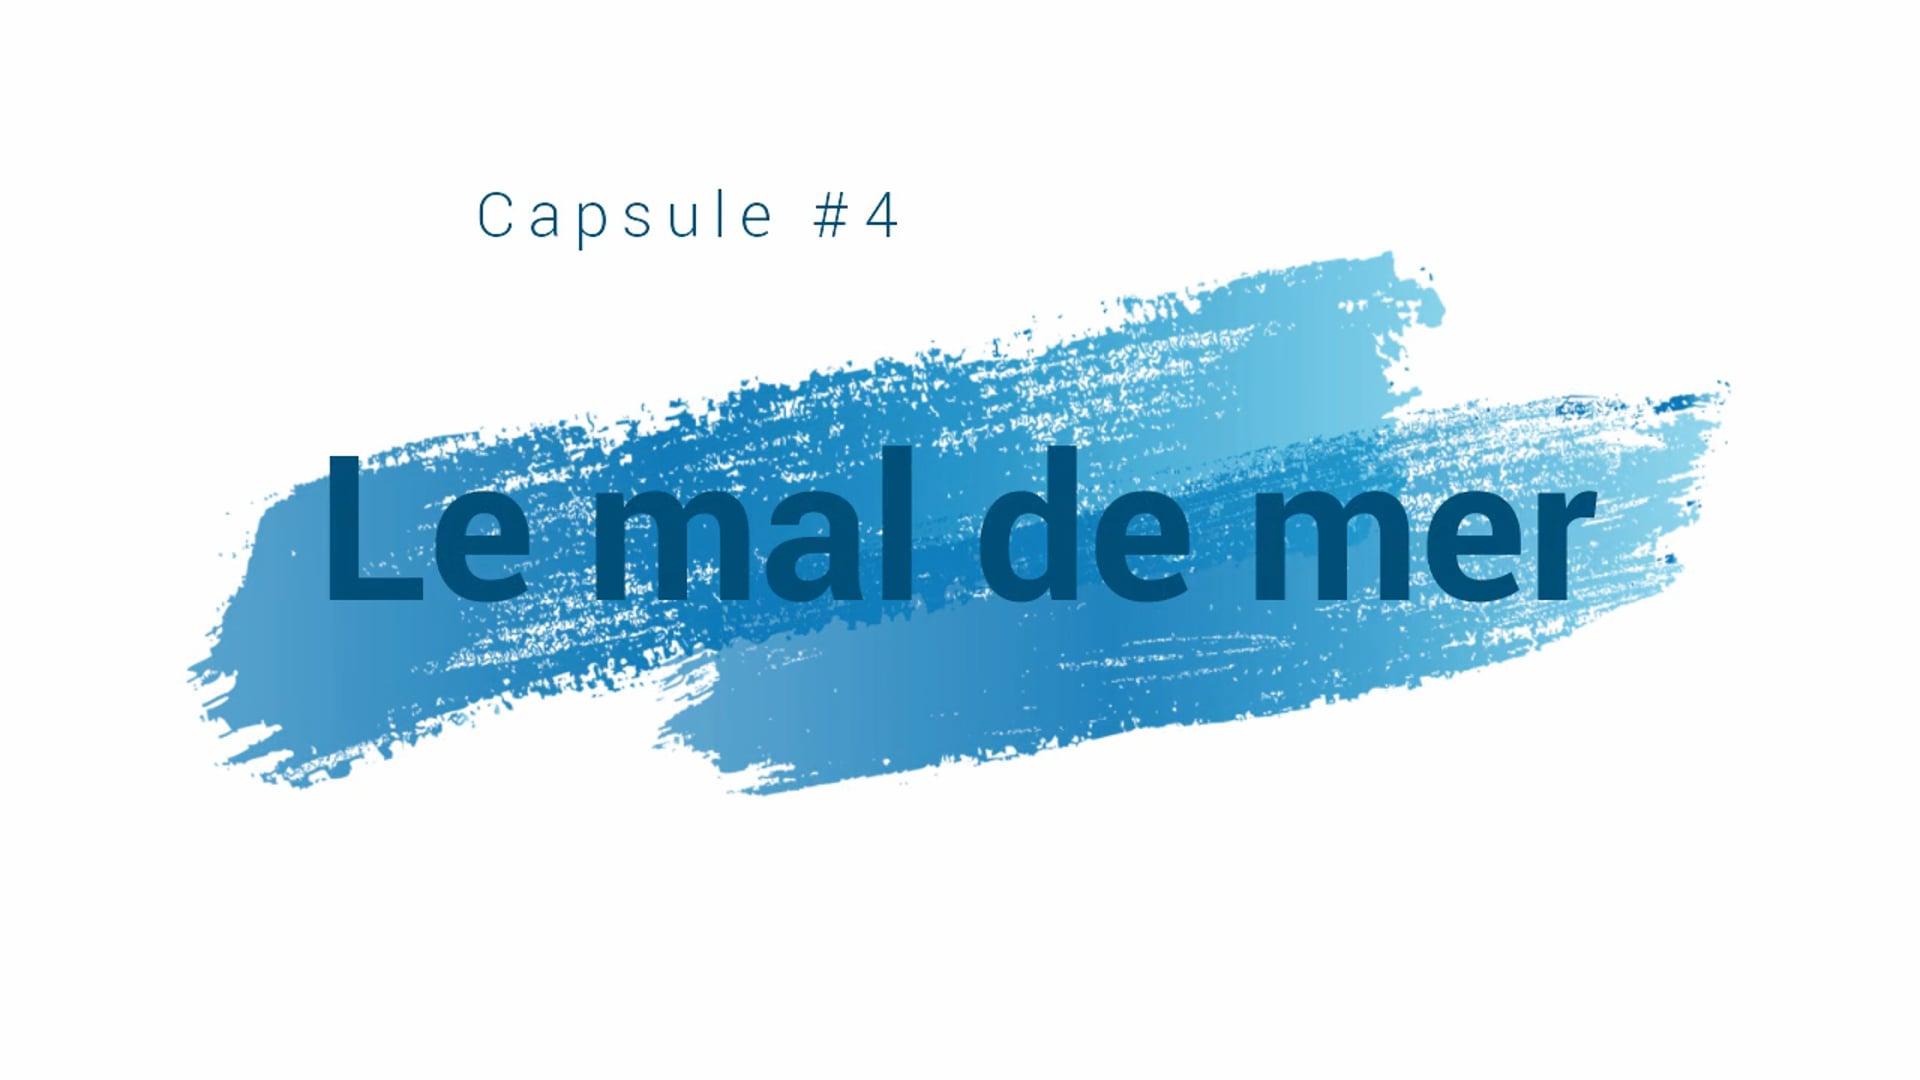 Capsule 4 - Le mal de mer